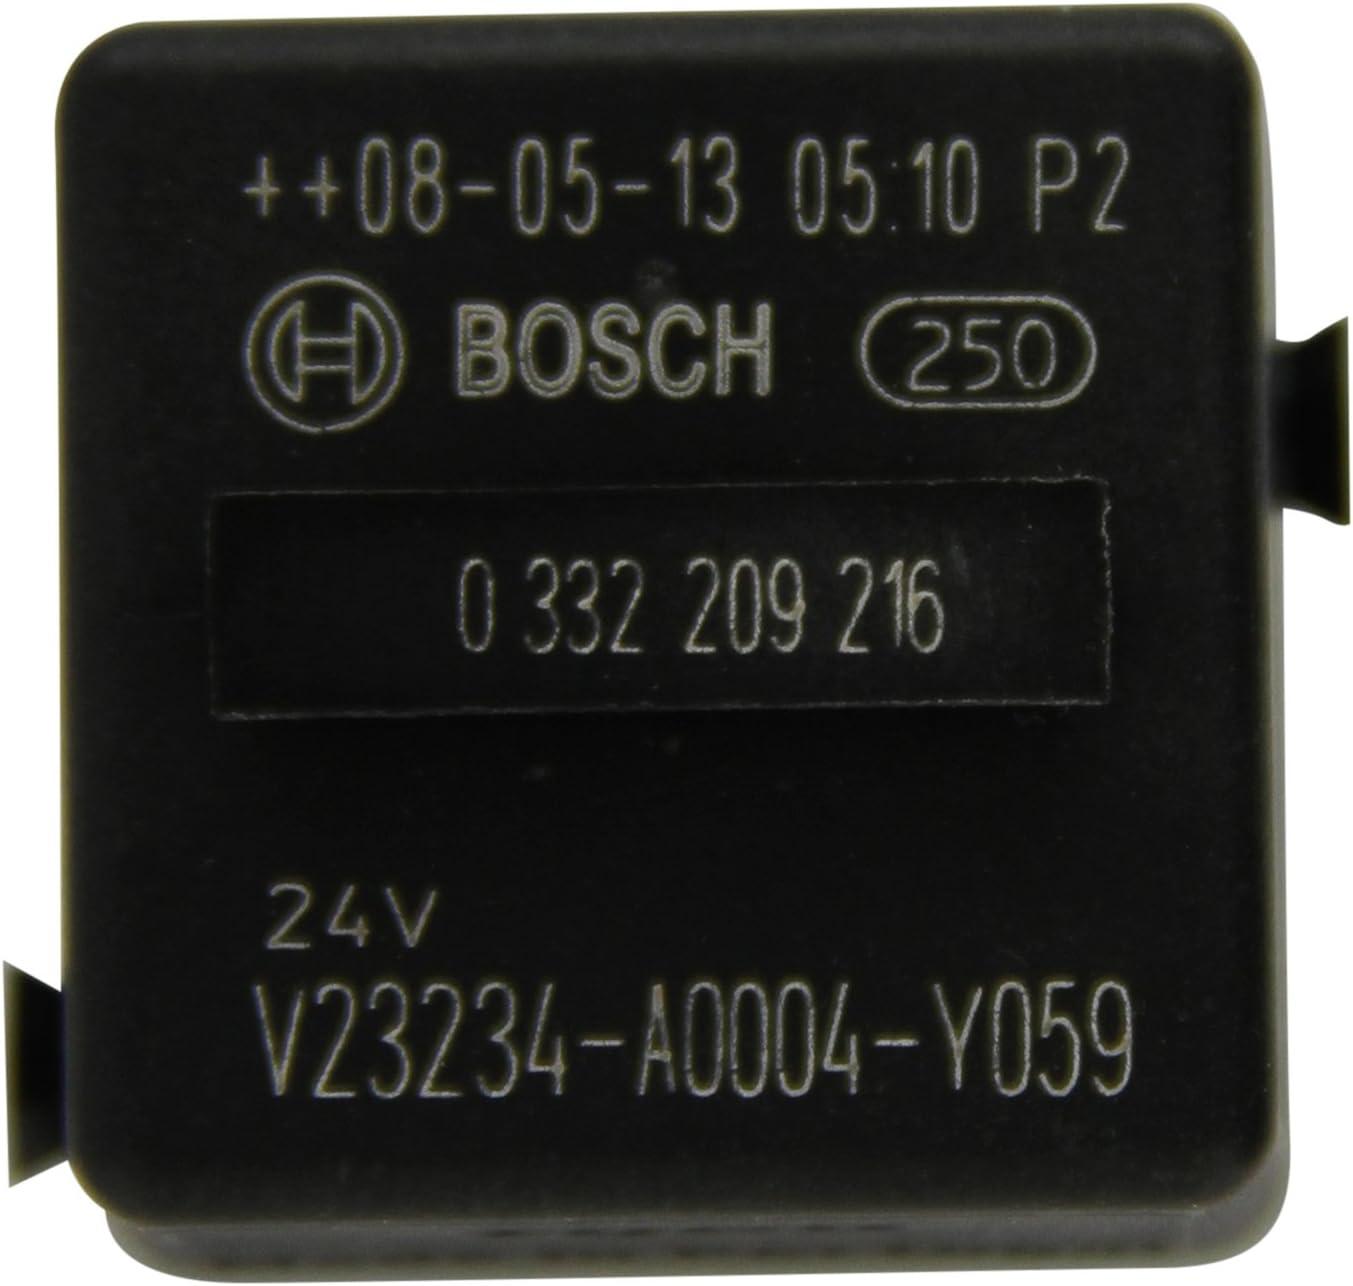 Bosch 0332209216 Mini relé de 24 V 20A, IP5K4, temperatura de funcionamiento de -40° a 85°C, relé de 5 pines